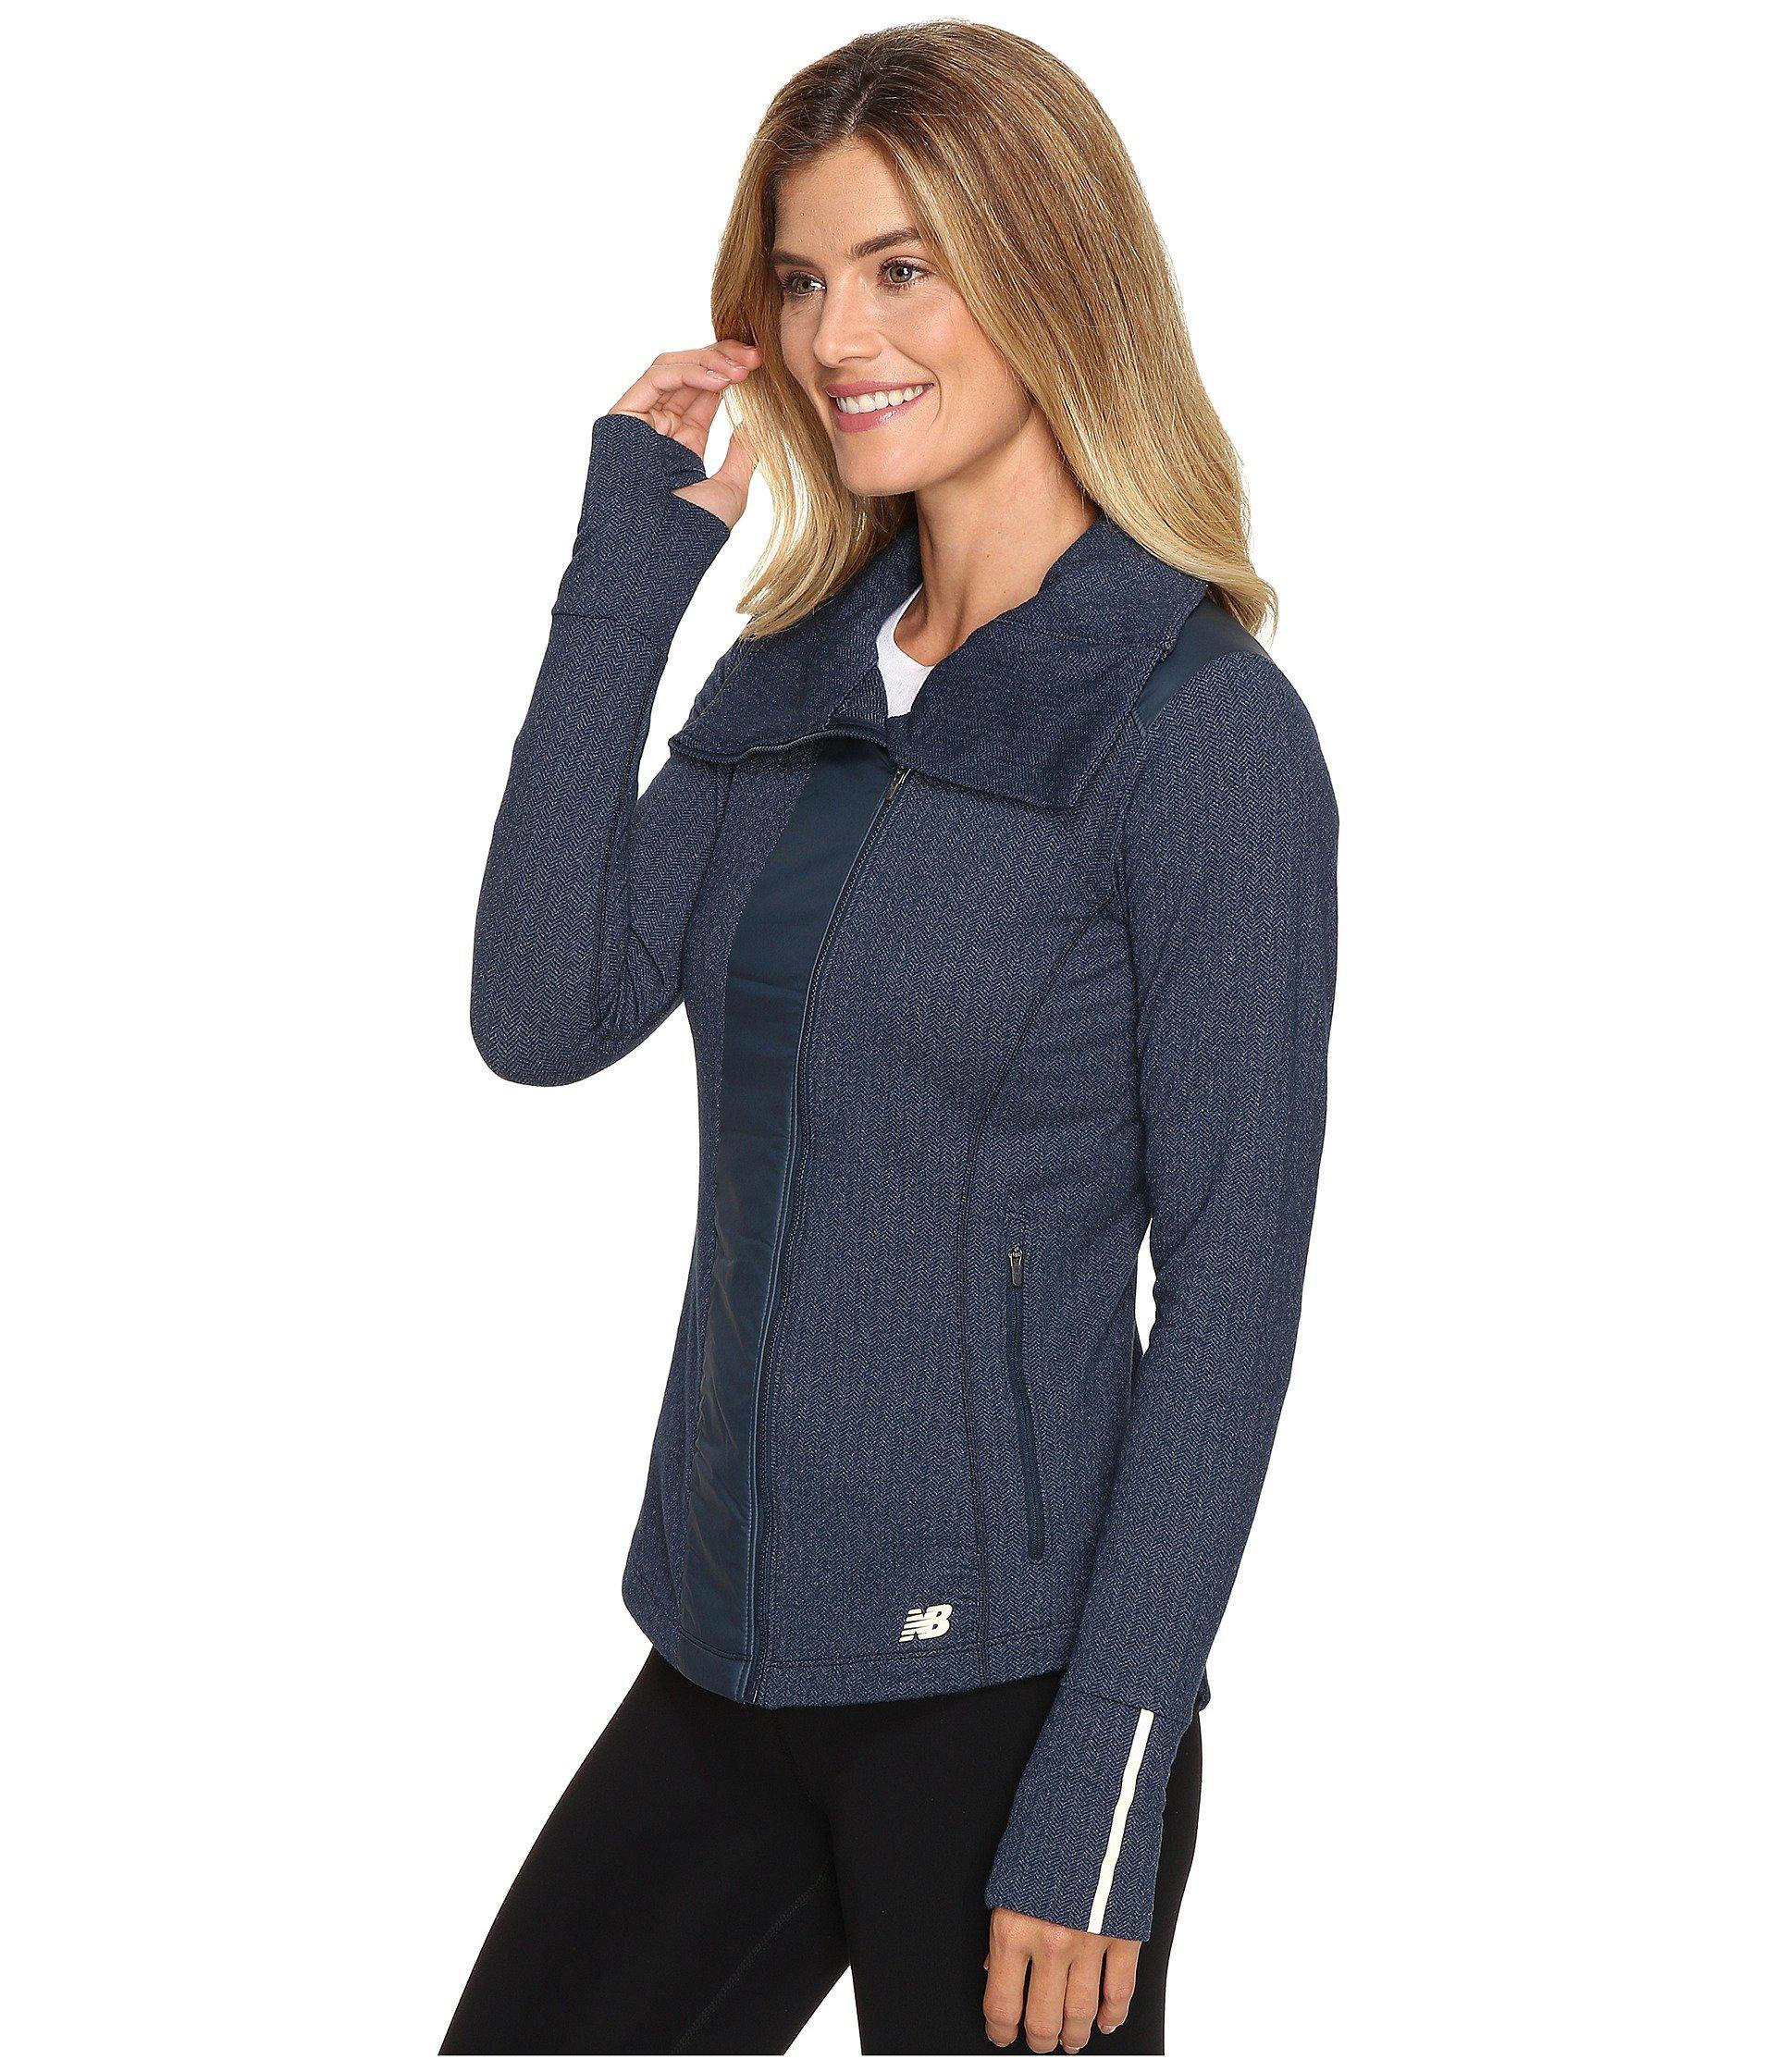 b500399b4aa50 New Balance Novelty Heat Jacket in Blue - Lyst